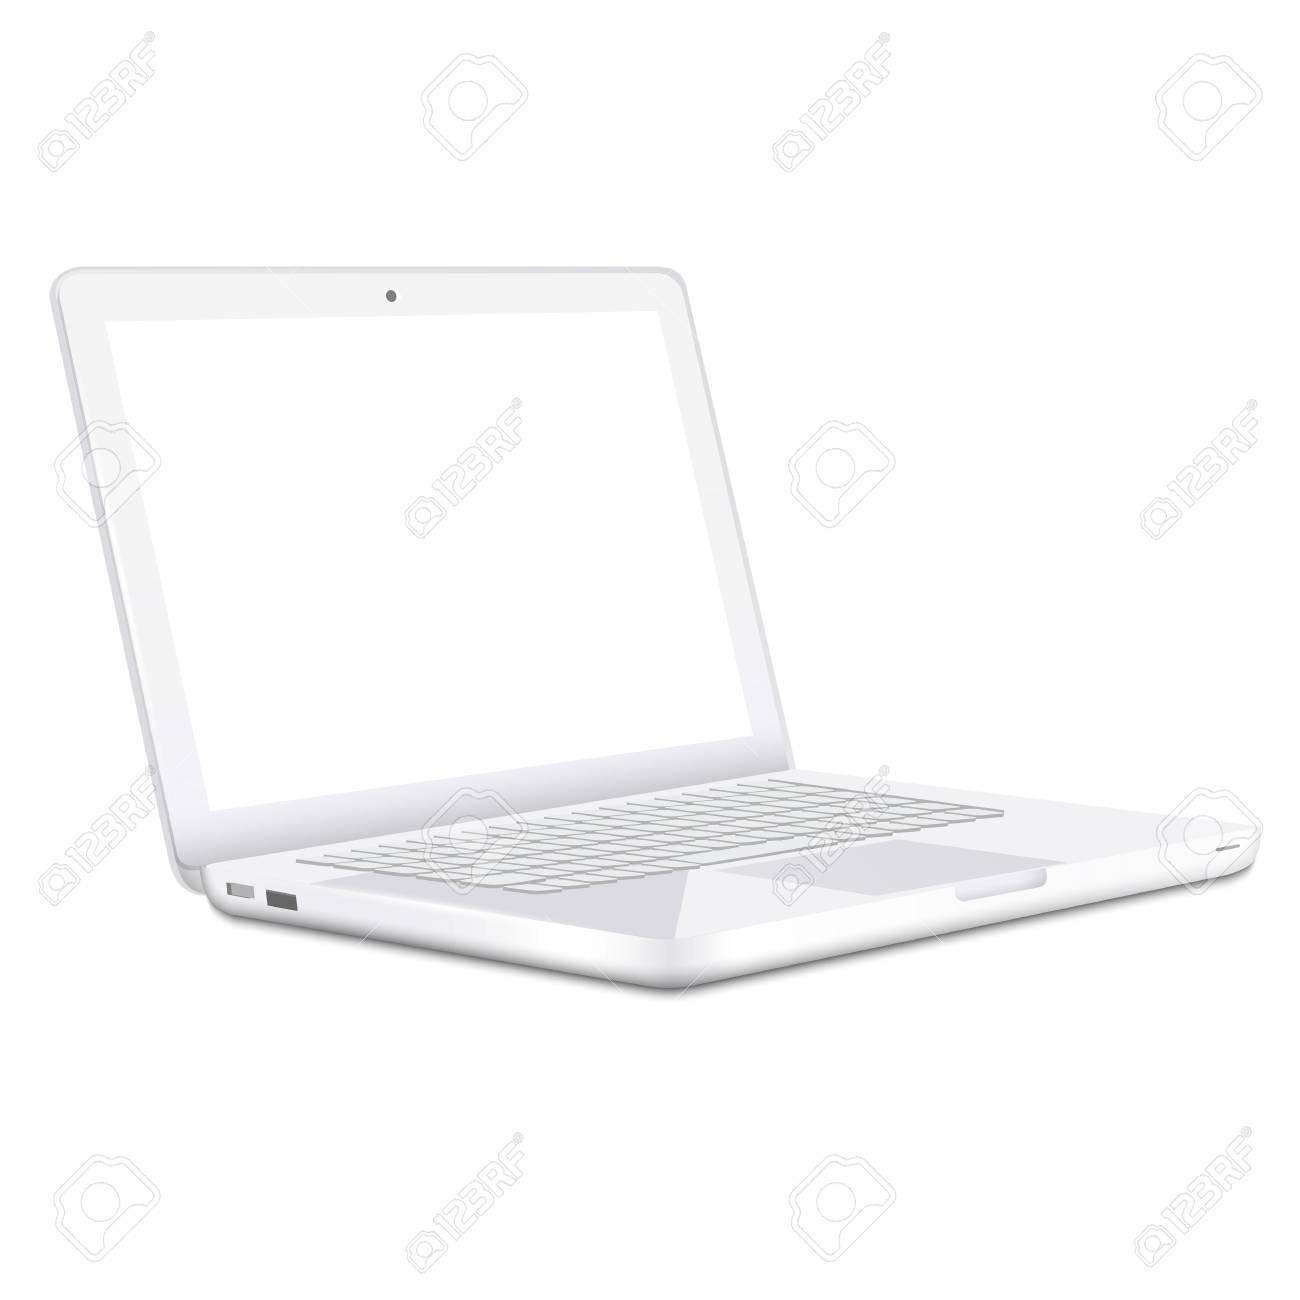 Modern white Laptop isolated on white background  Vector Stock Vector - 17338500